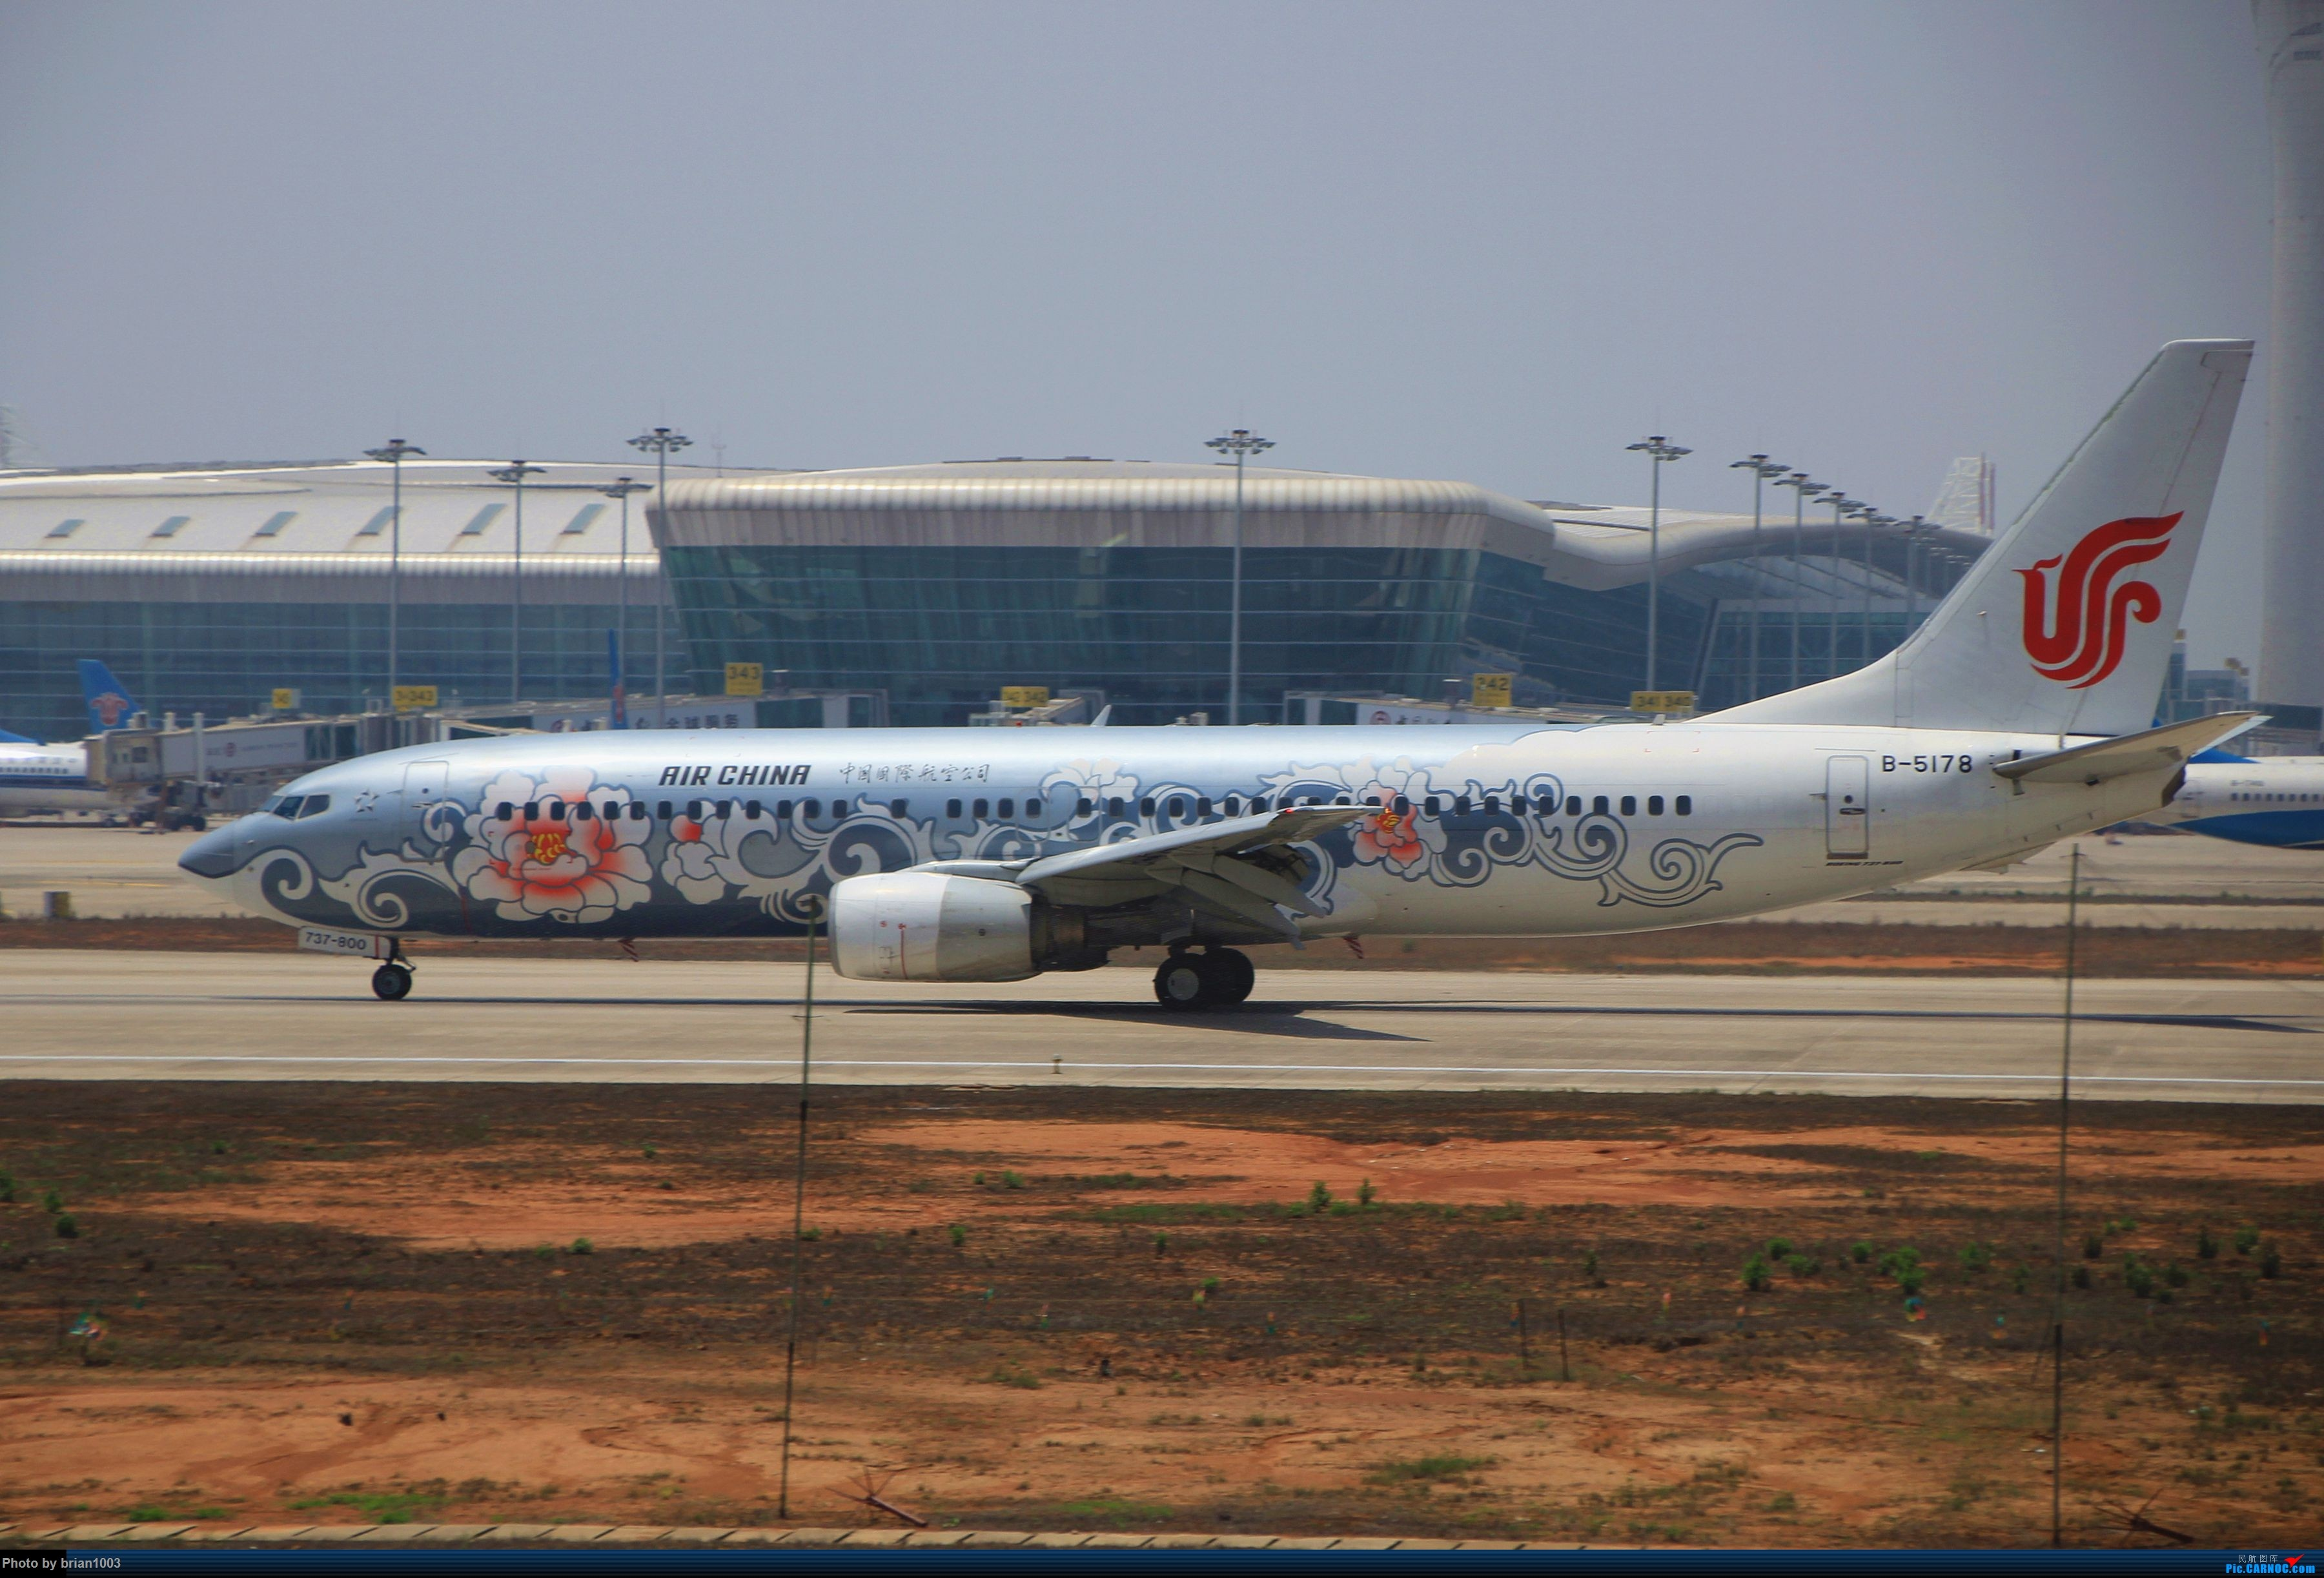 Re:[原创]WUH武汉天河机场拍机之喜迎酷航788和偶遇某其他飞机 BOEING 737-800 B-5178